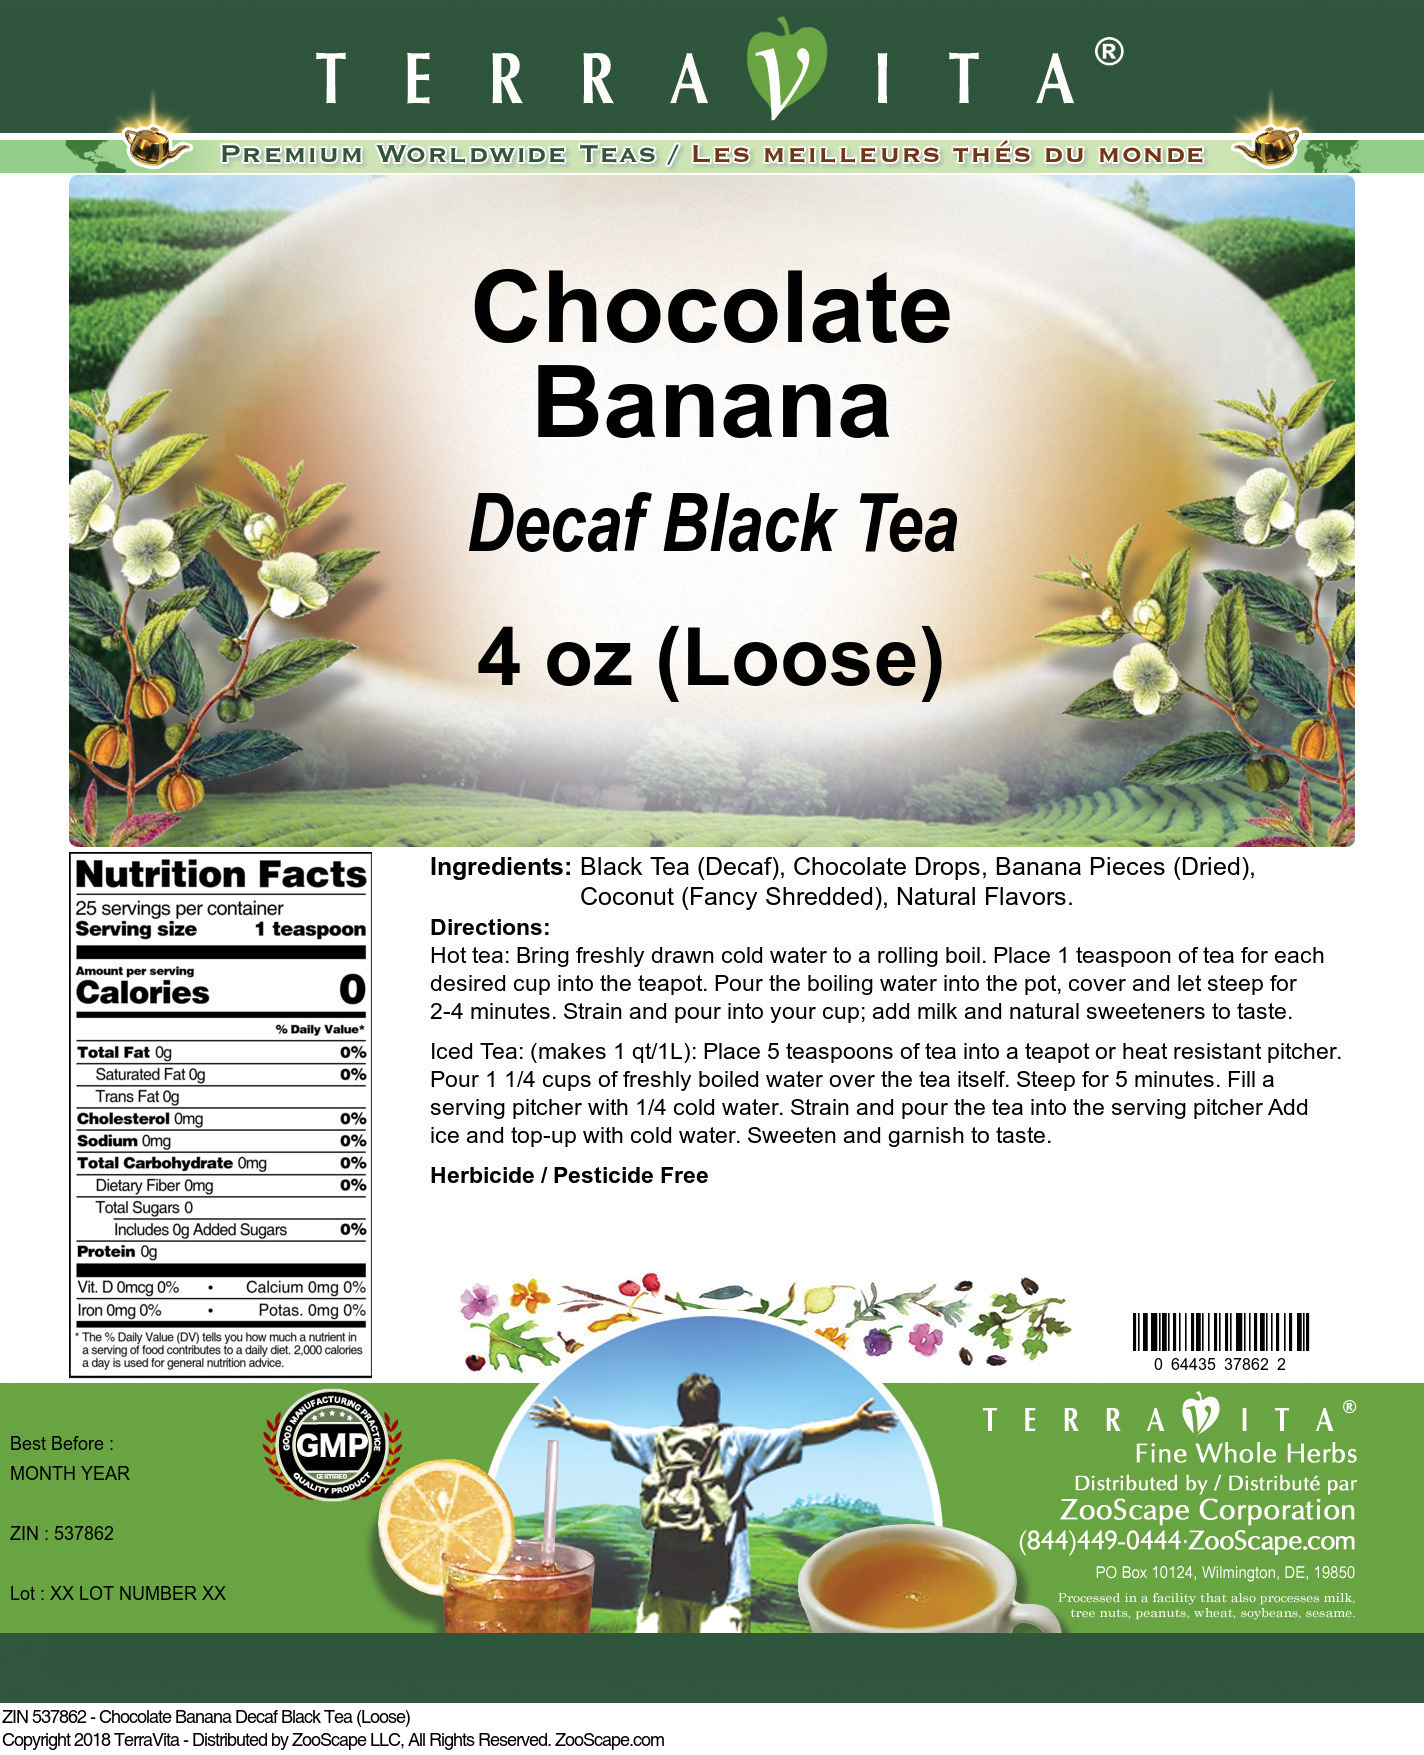 Chocolate Banana Decaf Black Tea (Loose)